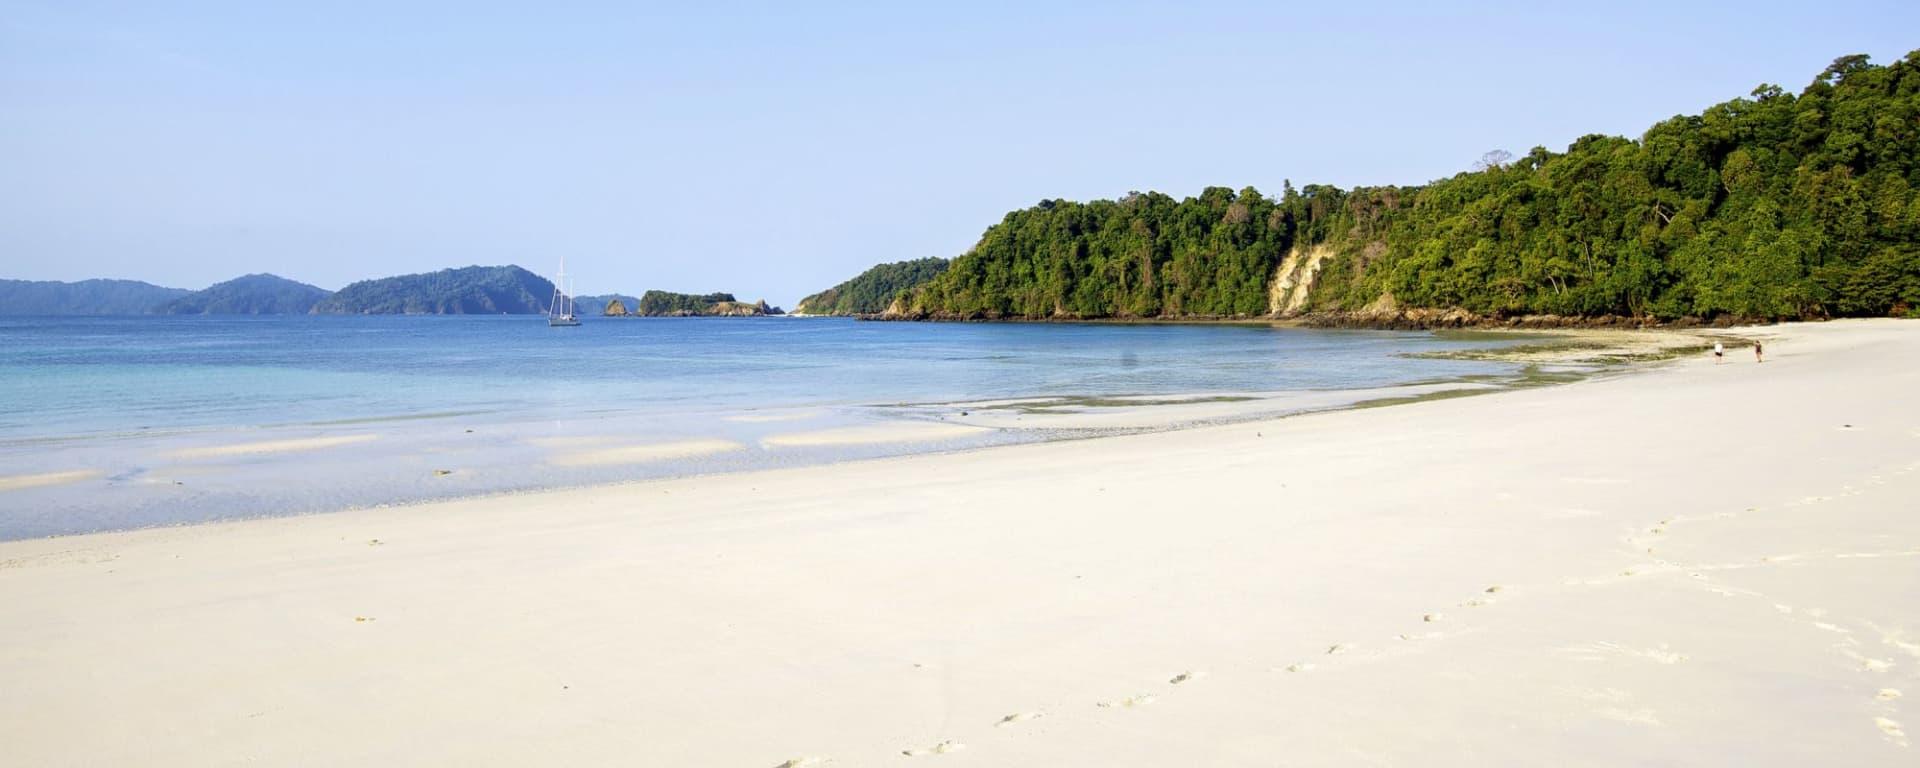 Segeltörn im paradiesischen Mergui Archipel ab Kawthaung: Mergui Archipelago